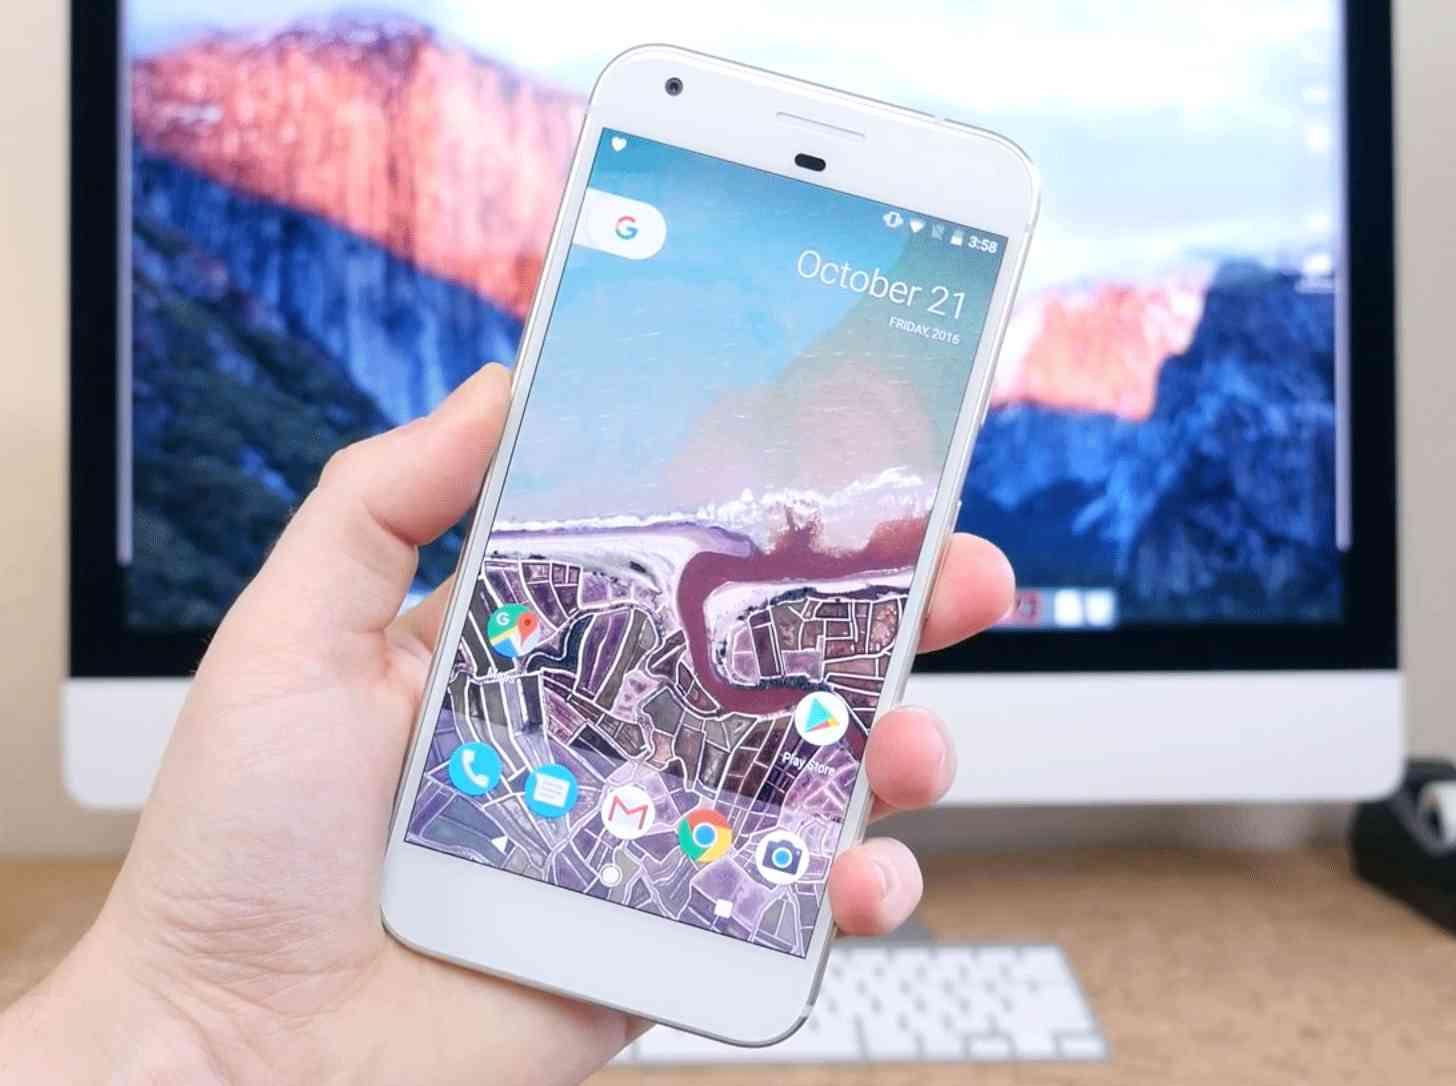 Google Pixel XL hands-on